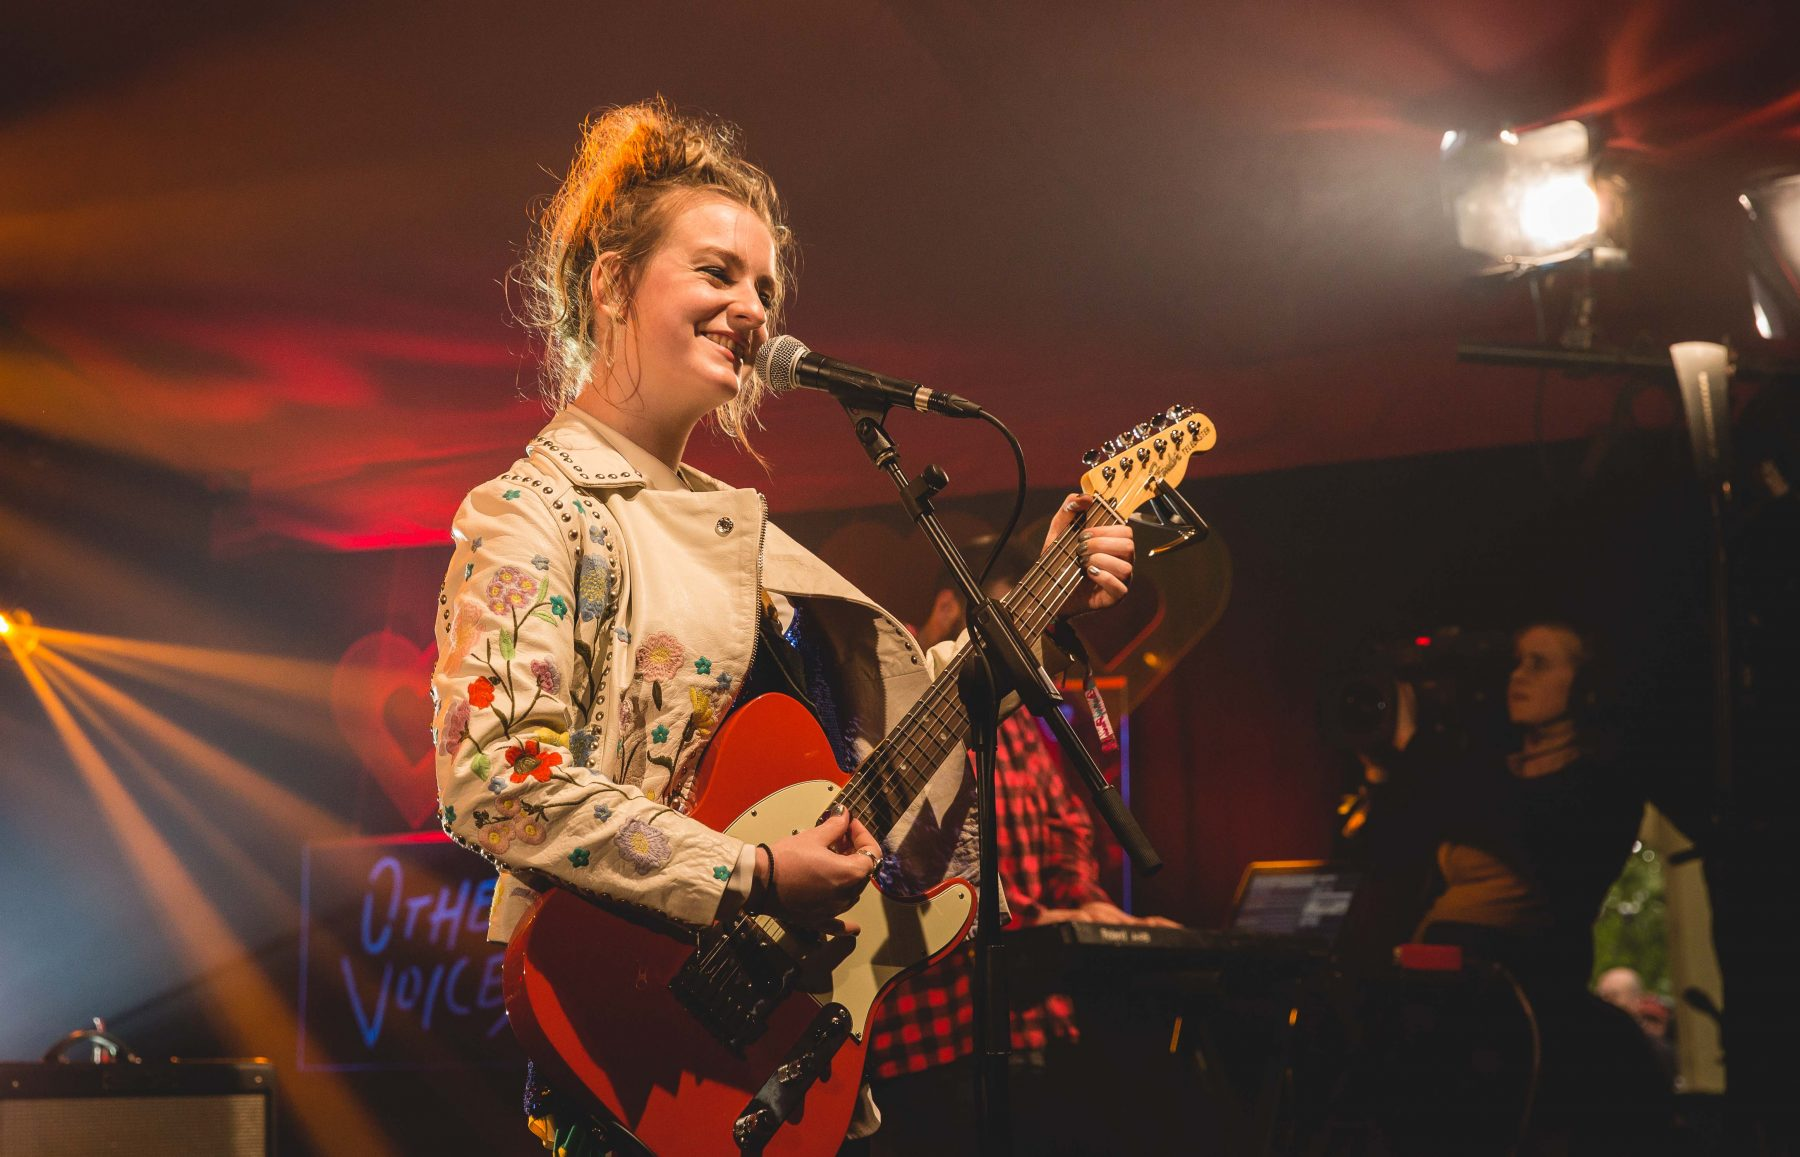 Katie Laffan_Other Voices_Electric Picnic 2017